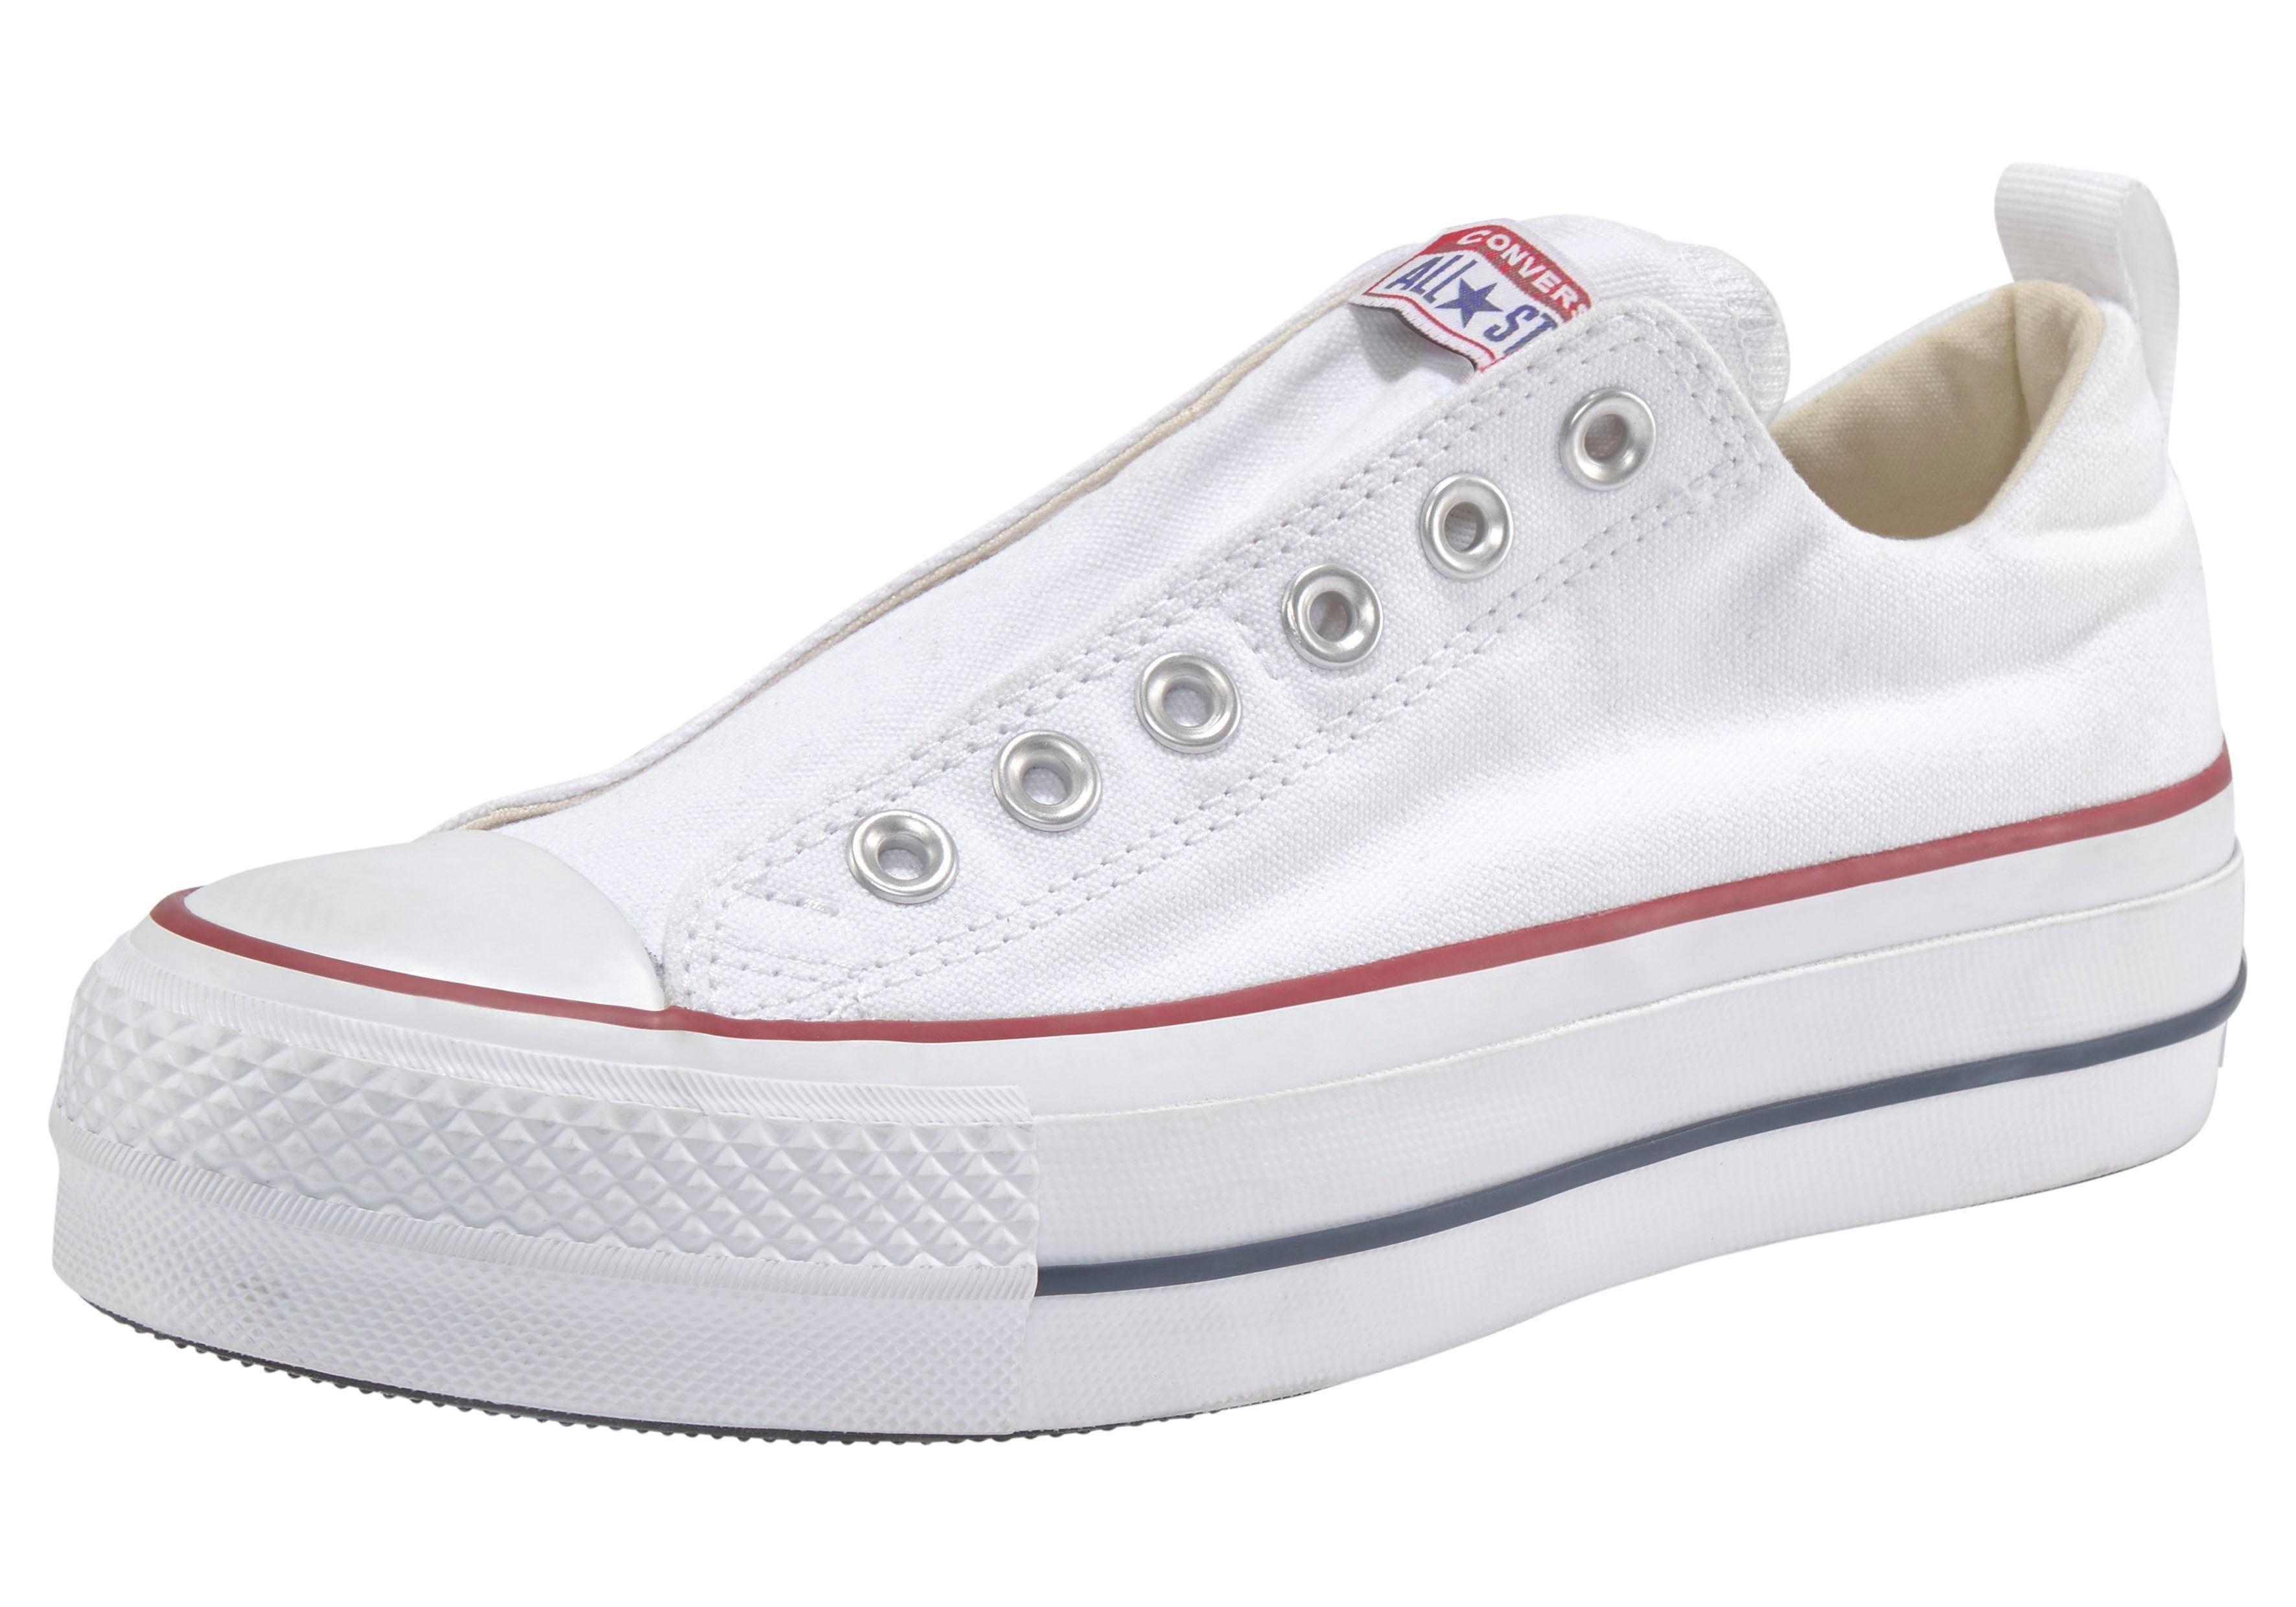 Converse »Chuck Taylor All Star Lift Slip Ox« Plateausneaker online kaufen   OTTO